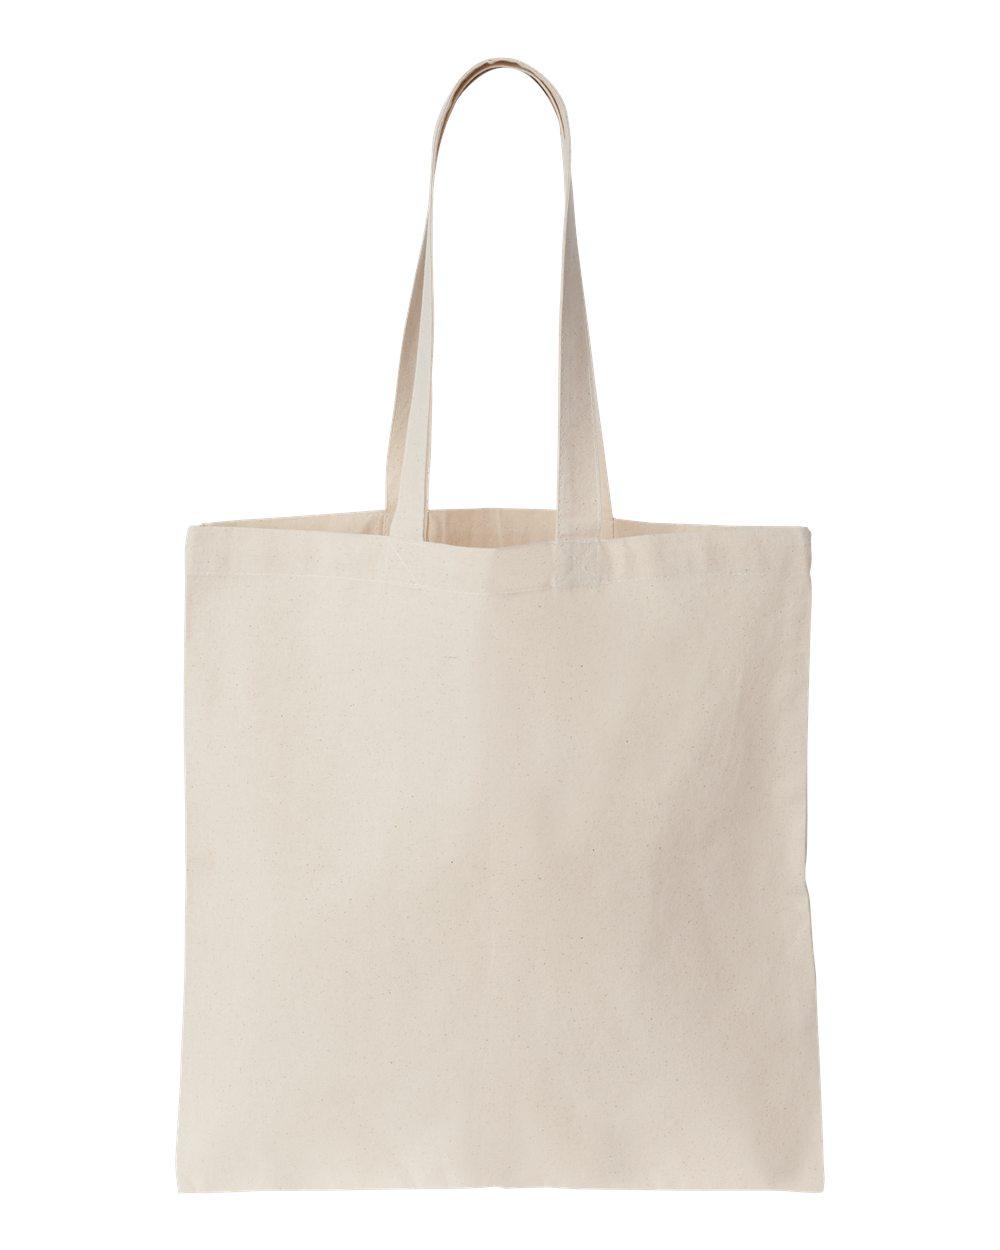 liberty bags 8860 nicole cotton canvas tote needen usa